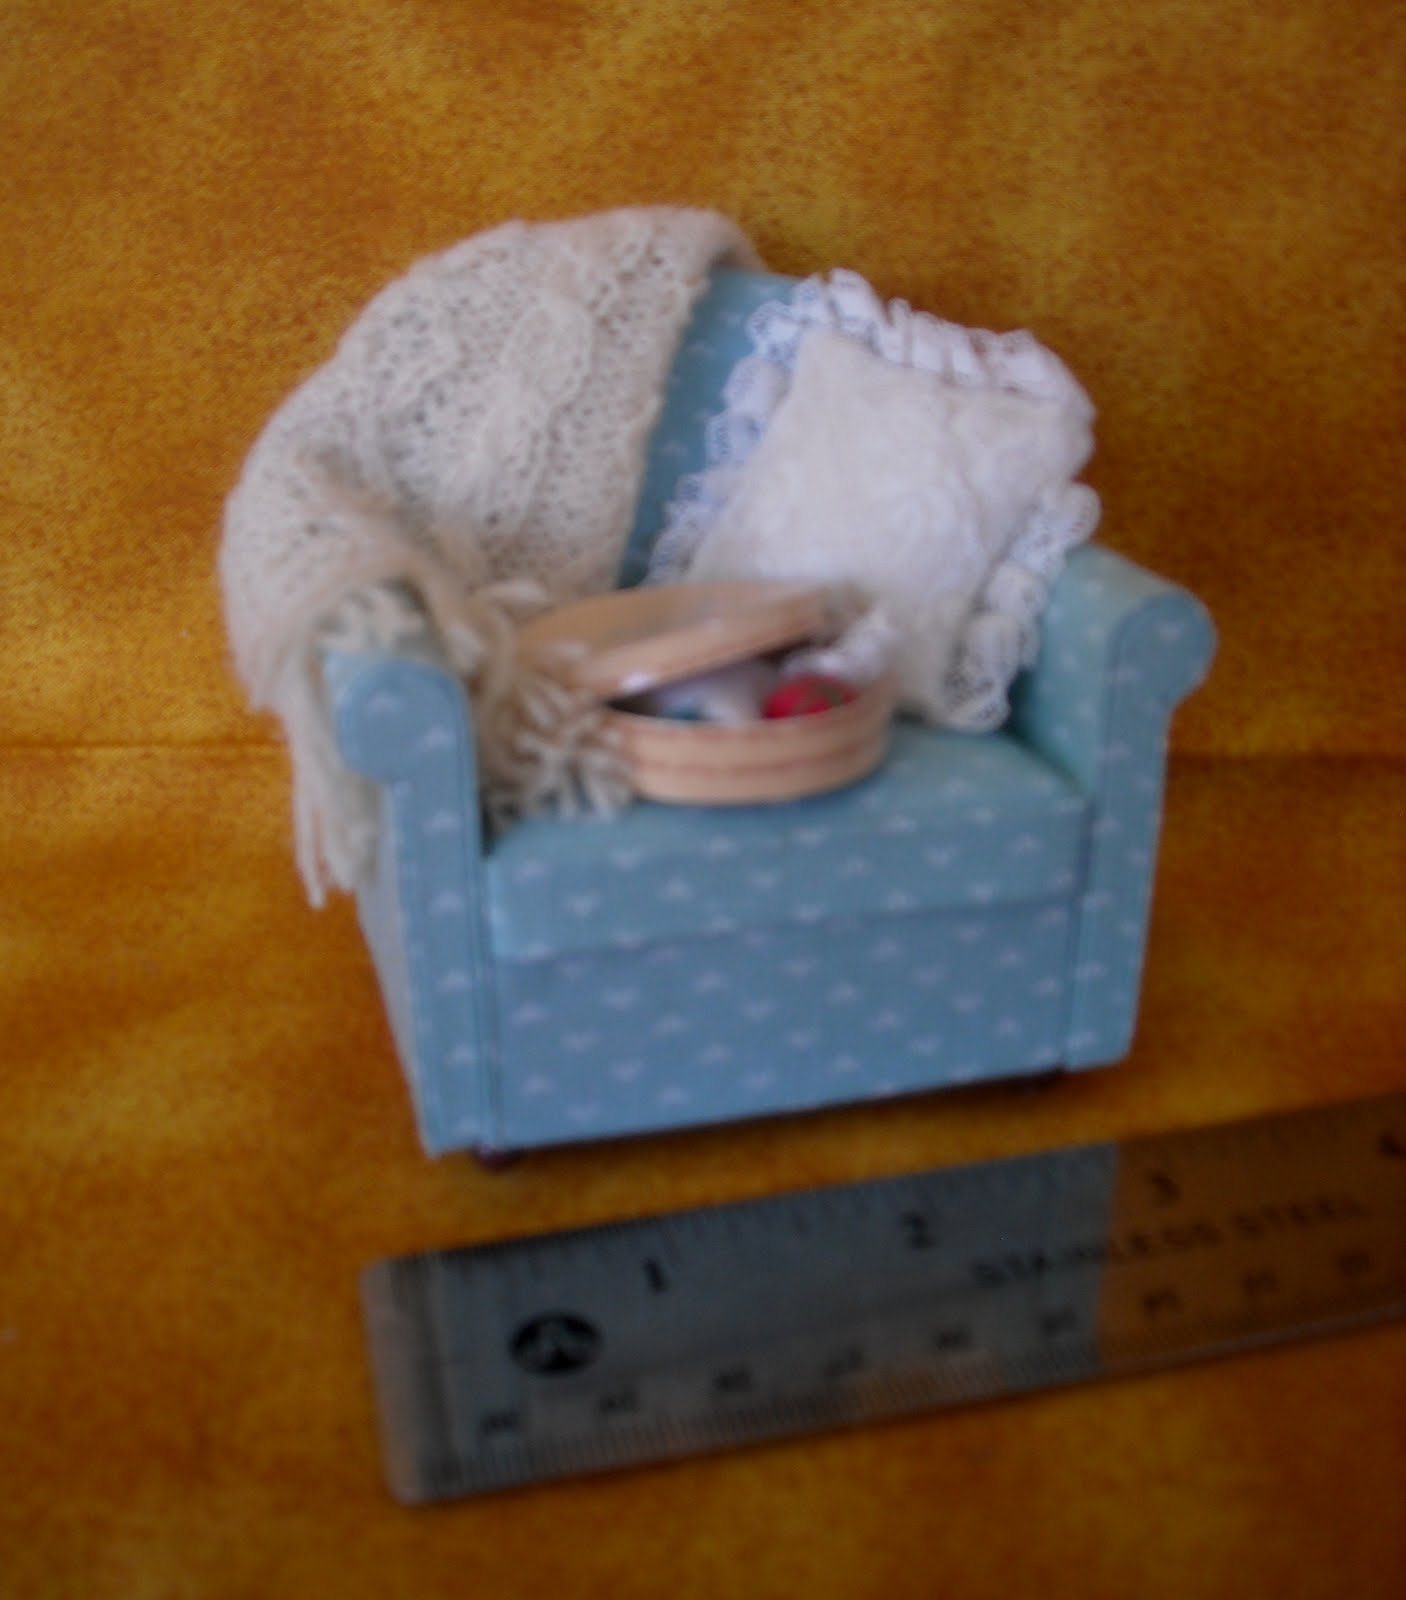 Old Days Old Ways Mniiatures Monday Tiny Armchair